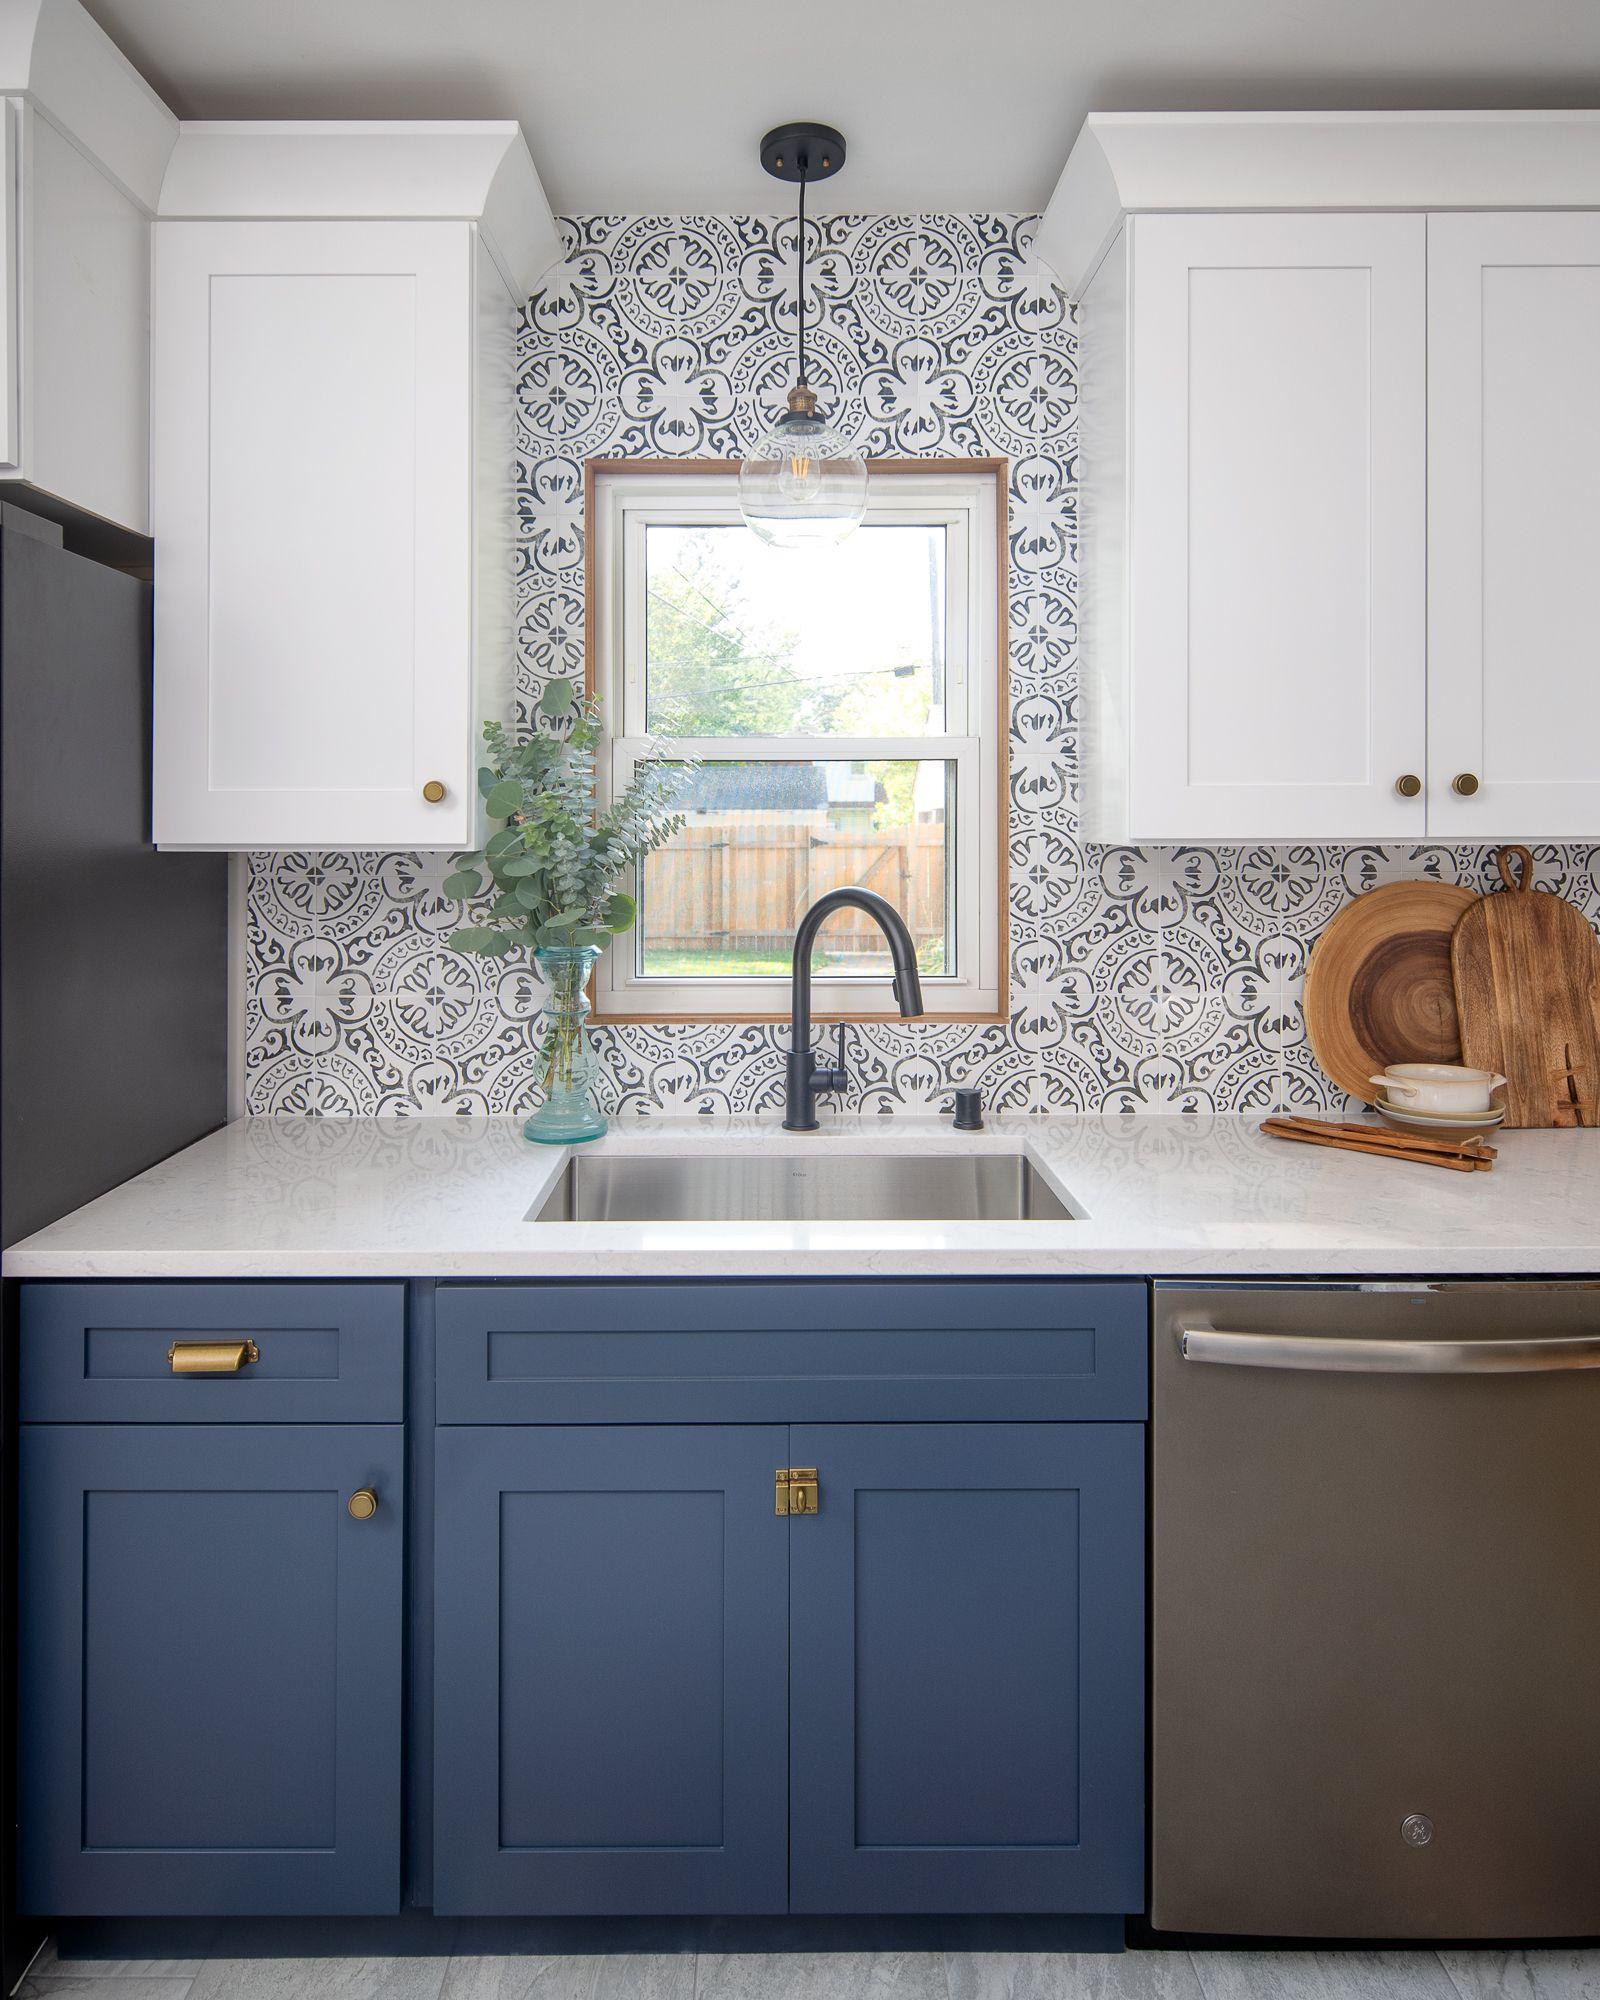 St Louis Park Kitchen Remodel Before After Construction2style Kitchen Remodel Kitchen Backsplash Designs Custom Kitchen Cabinets